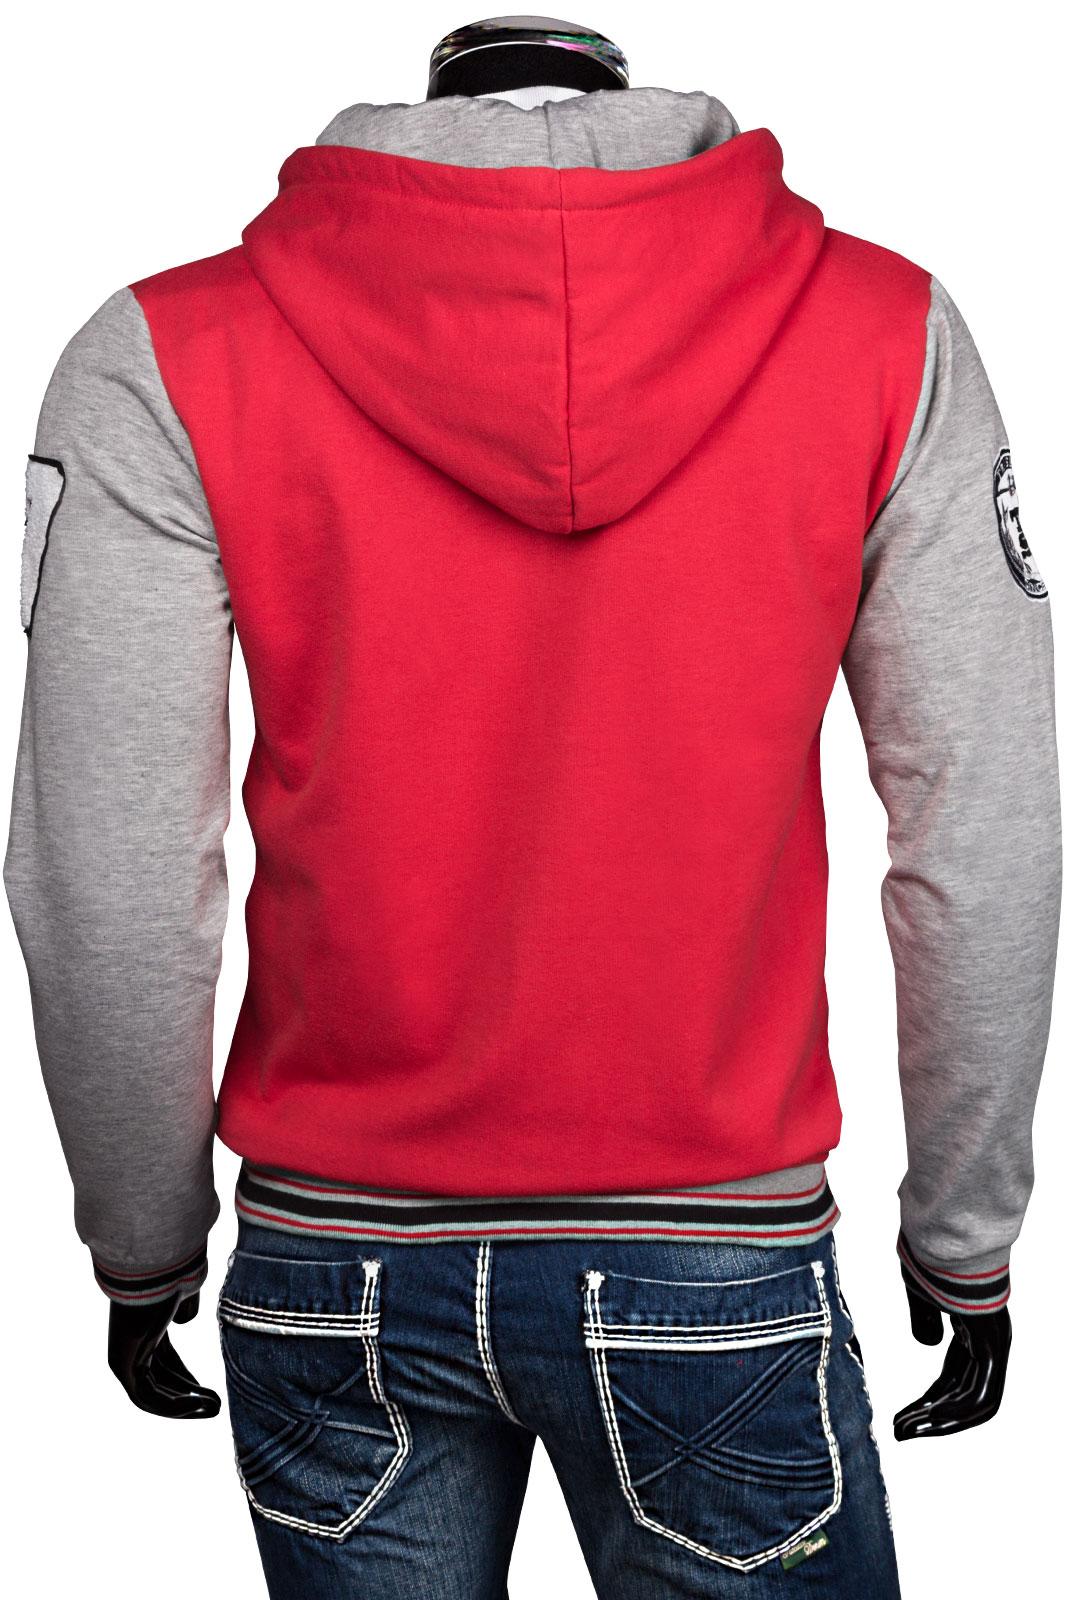 Trisens hoodie oldschool kapuzen college sport jacke sweatjacke rot xxl ebay - Rote college jacke ...